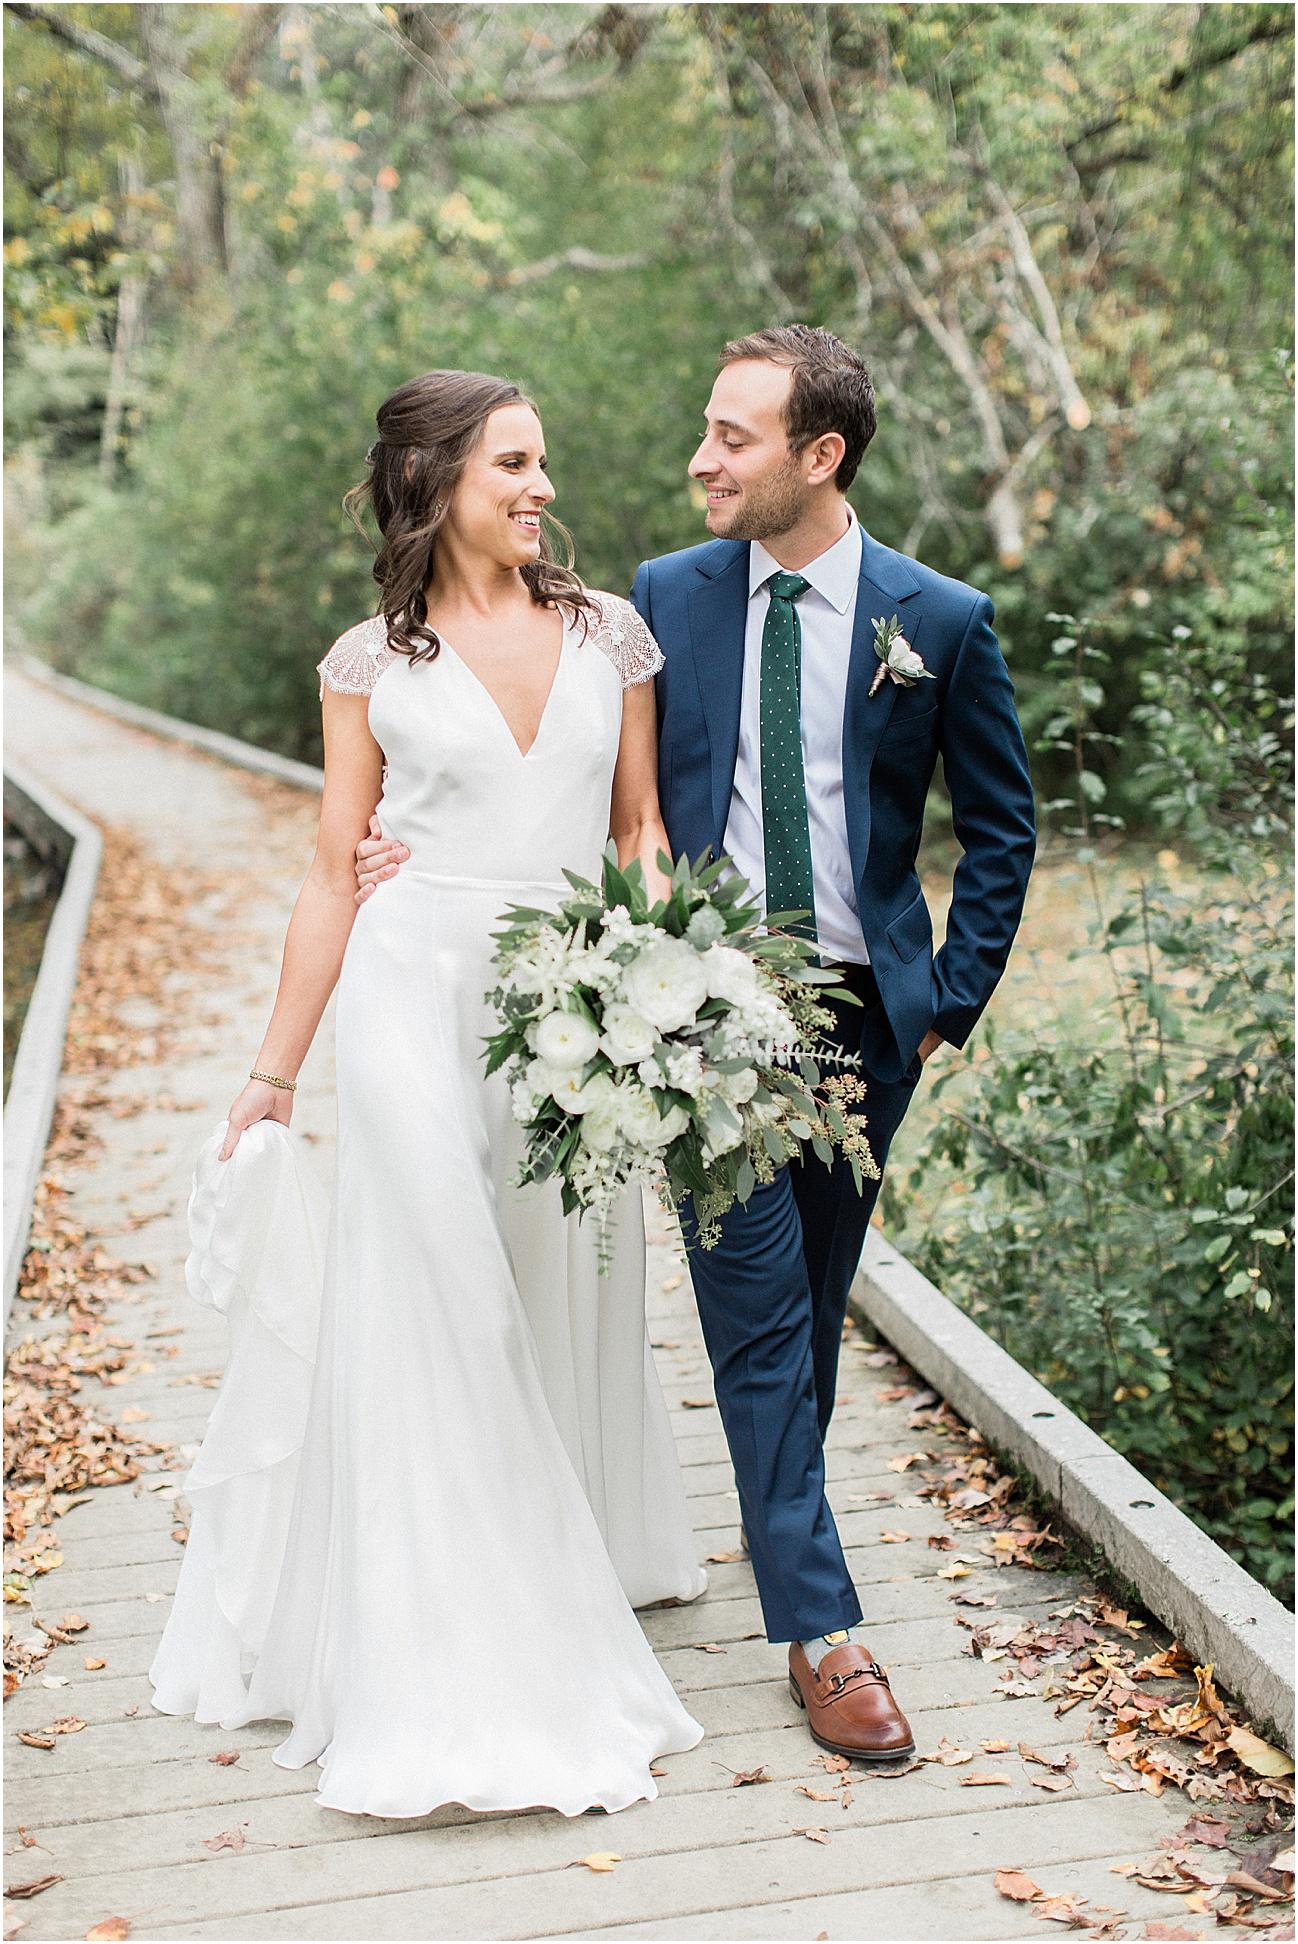 jenna_mike_willowdale_estate_topsfield_neutral_whites_greens_fall_cape_cod_boston_wedding_photographer_meredith_jane_photography_photo_1433.jpg